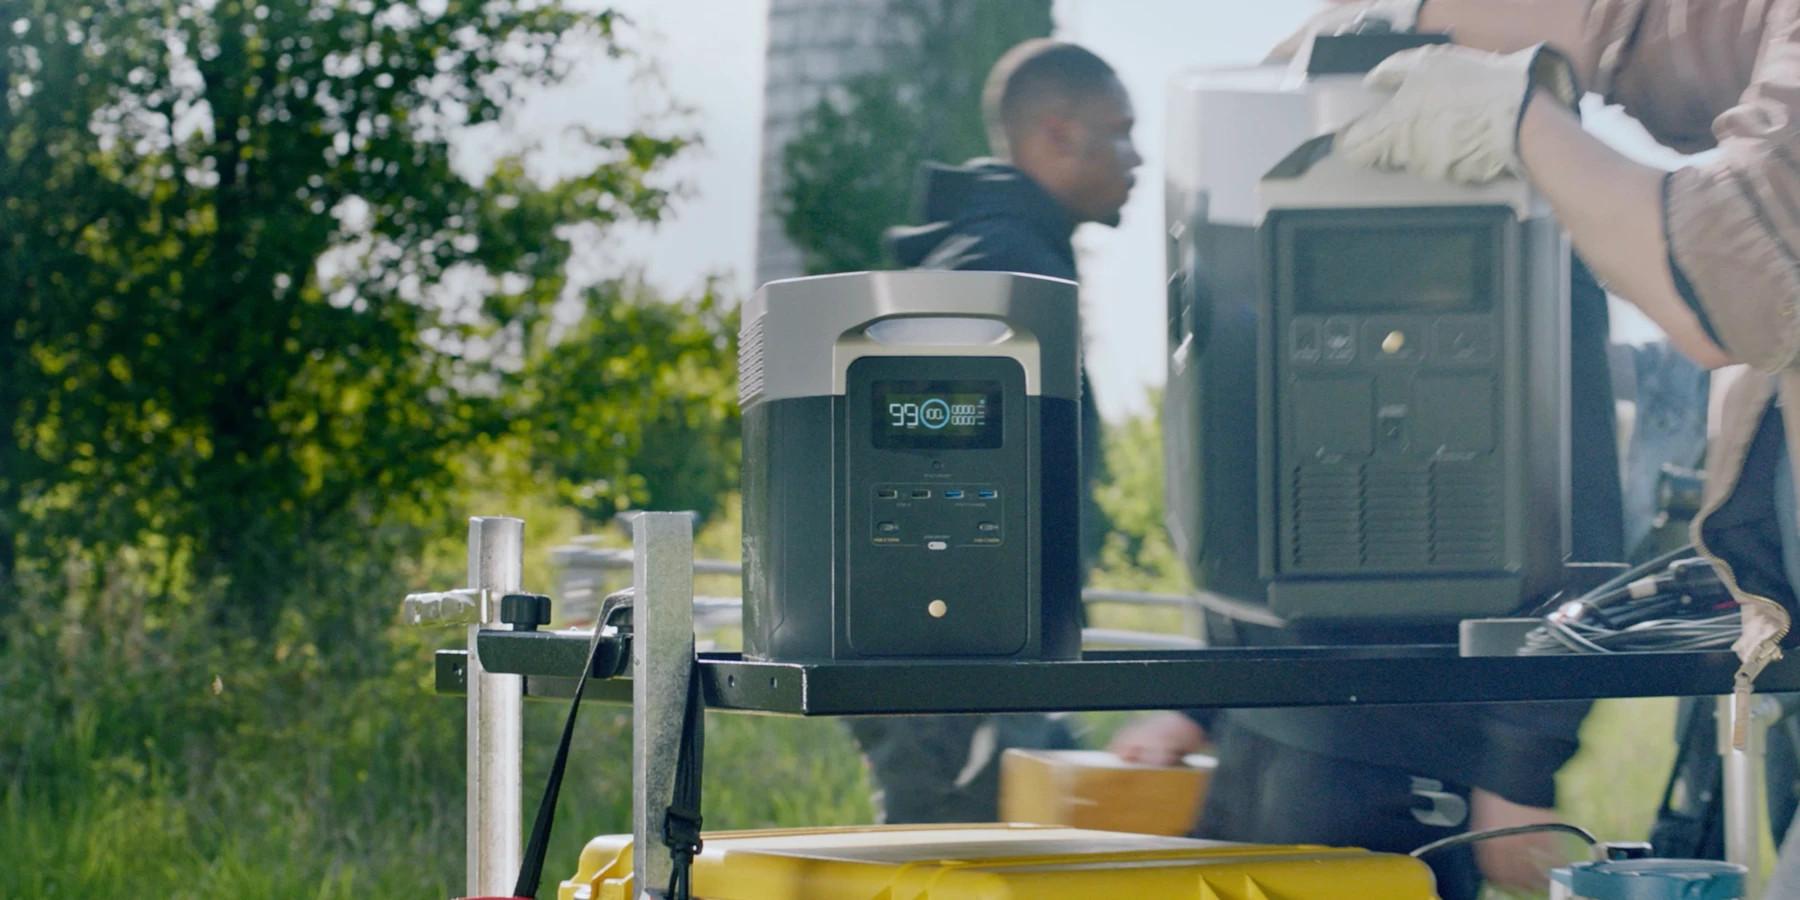 Agregat prądotwórczy Ecoflow Smart Generator